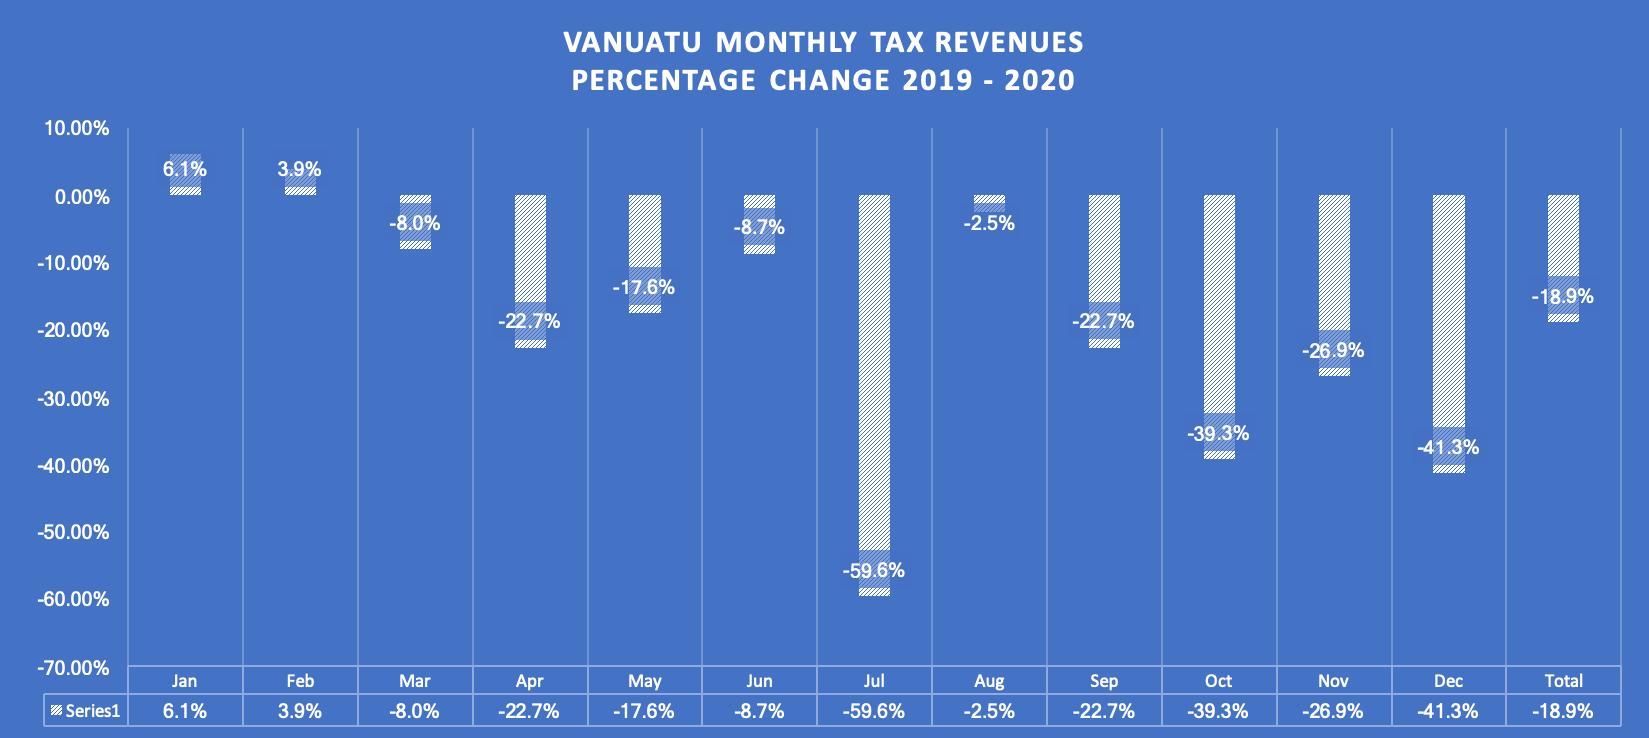 Vanuatu monthly tax revenues percentage change 2019 – 2020